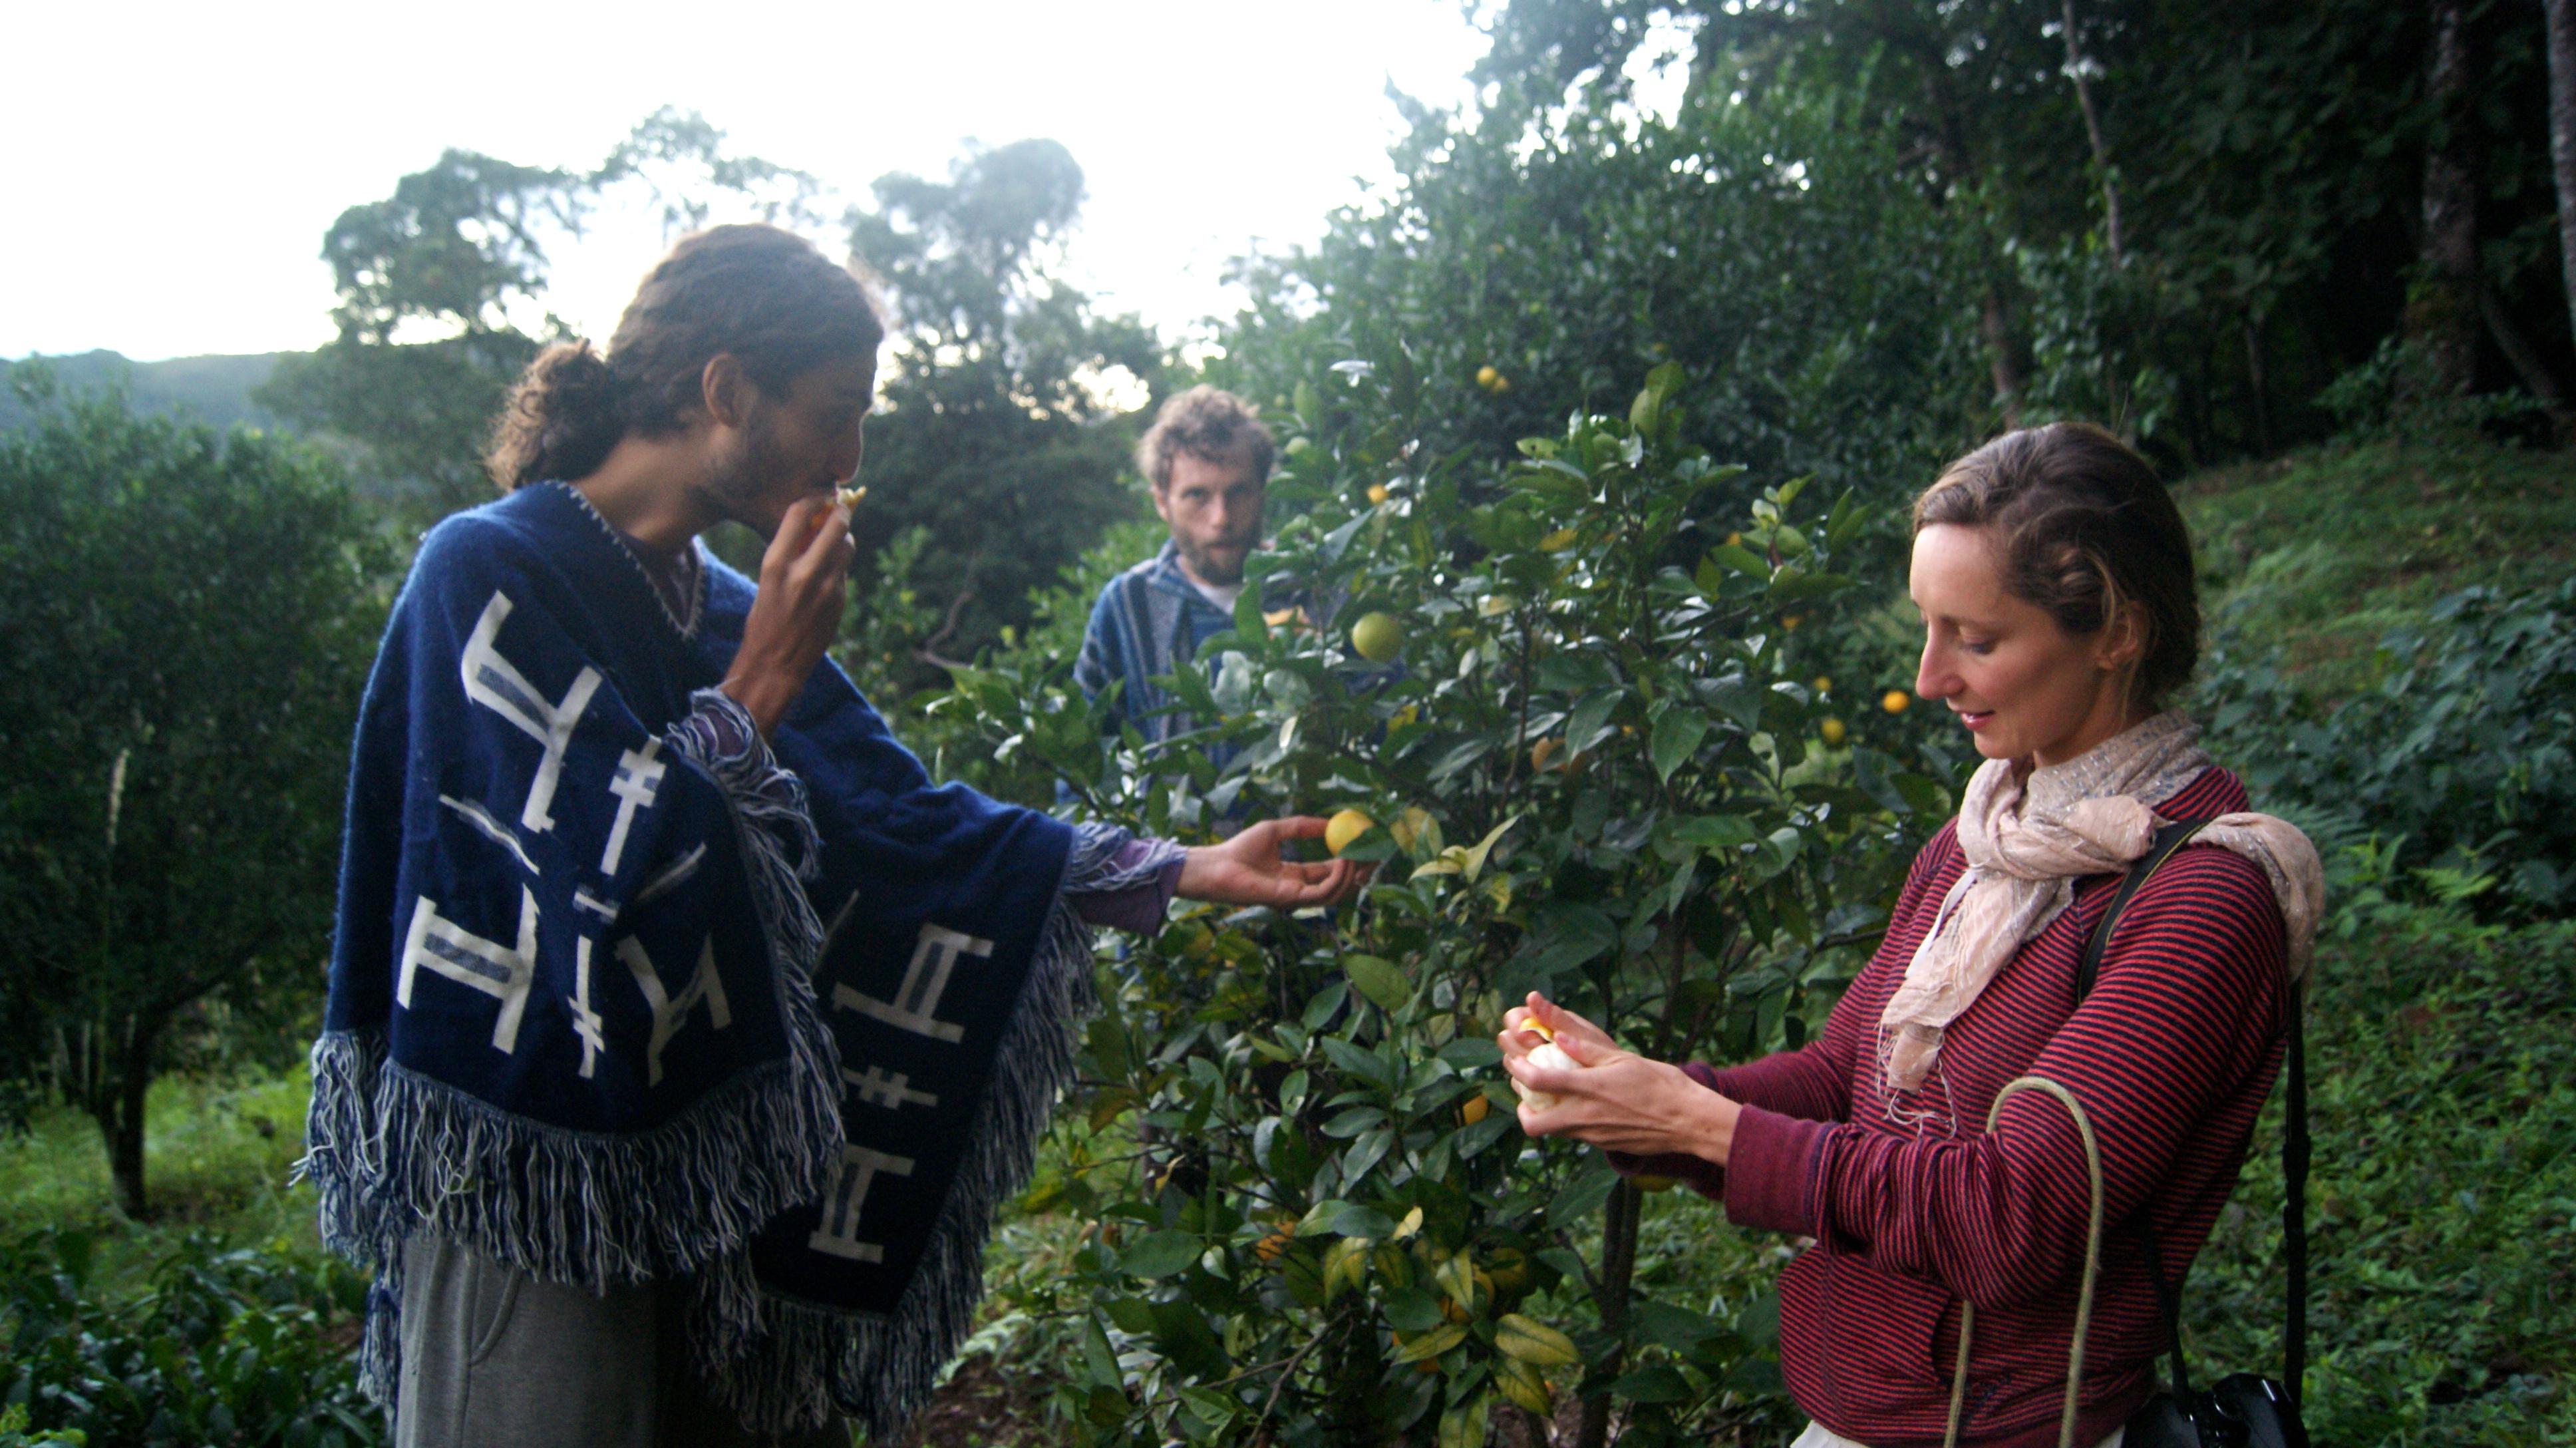 degustação de laranjas no pomar